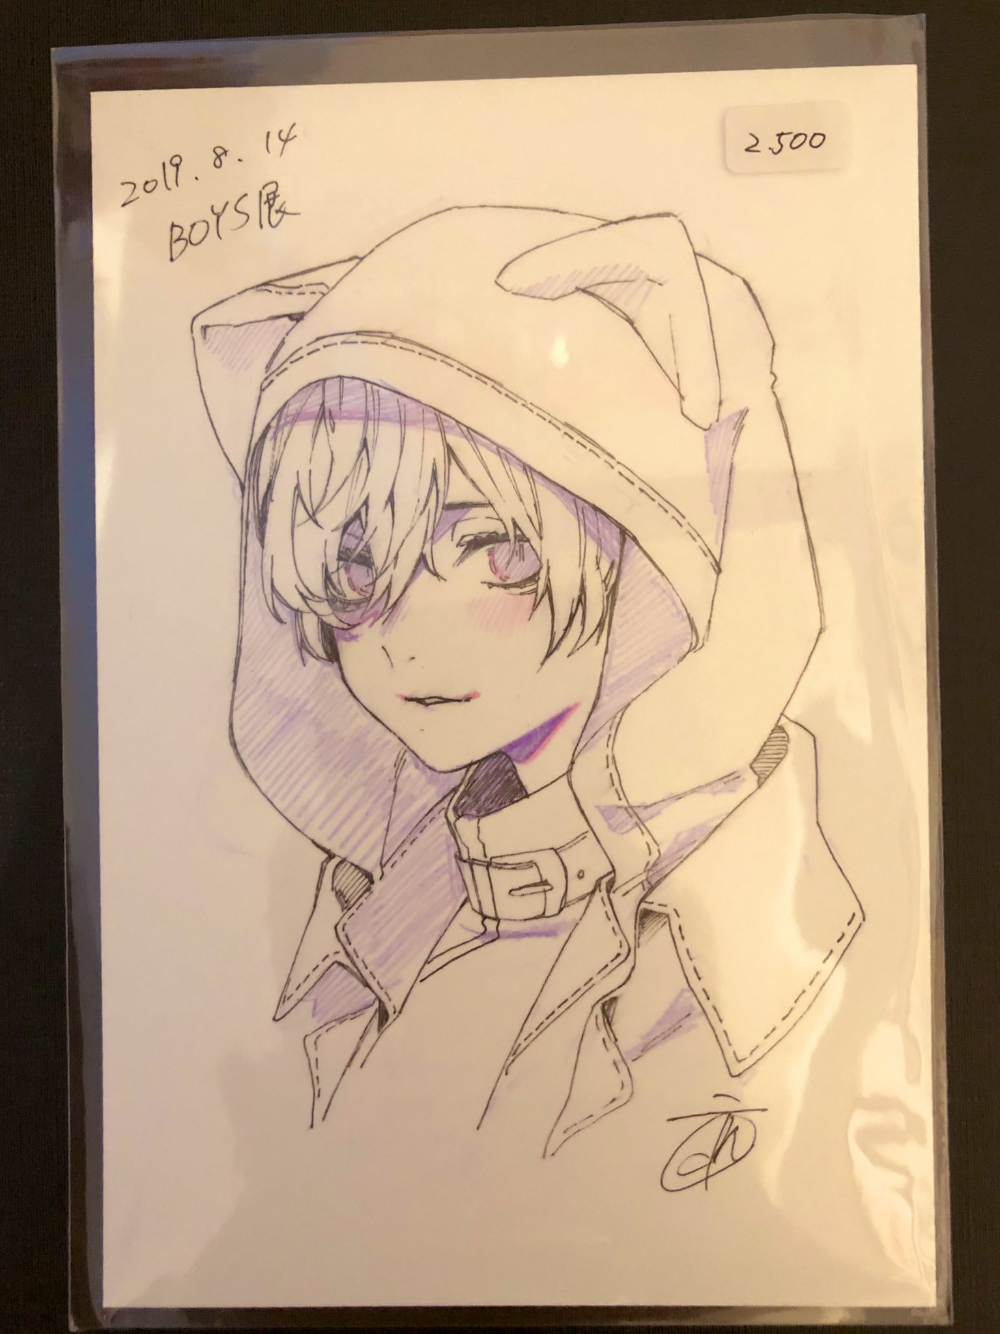 Photo of OTOCHI?夏色ハーモニー8/6〜 on Twitter